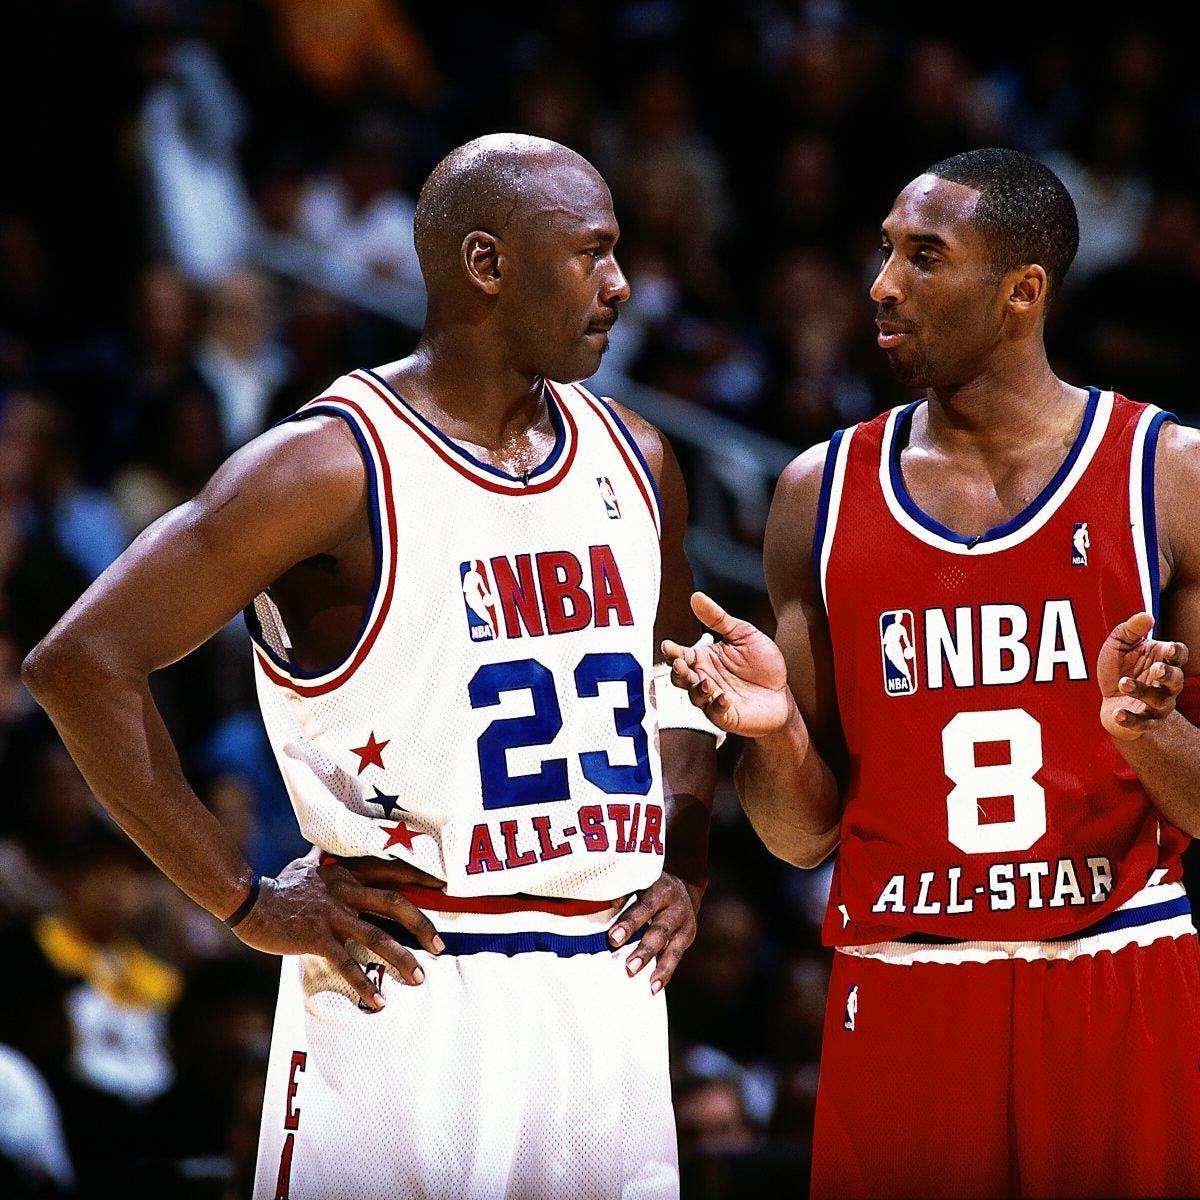 Kobe Bryant Praised Michael Jordan In 'The Last Dance' Before His Sudden Death